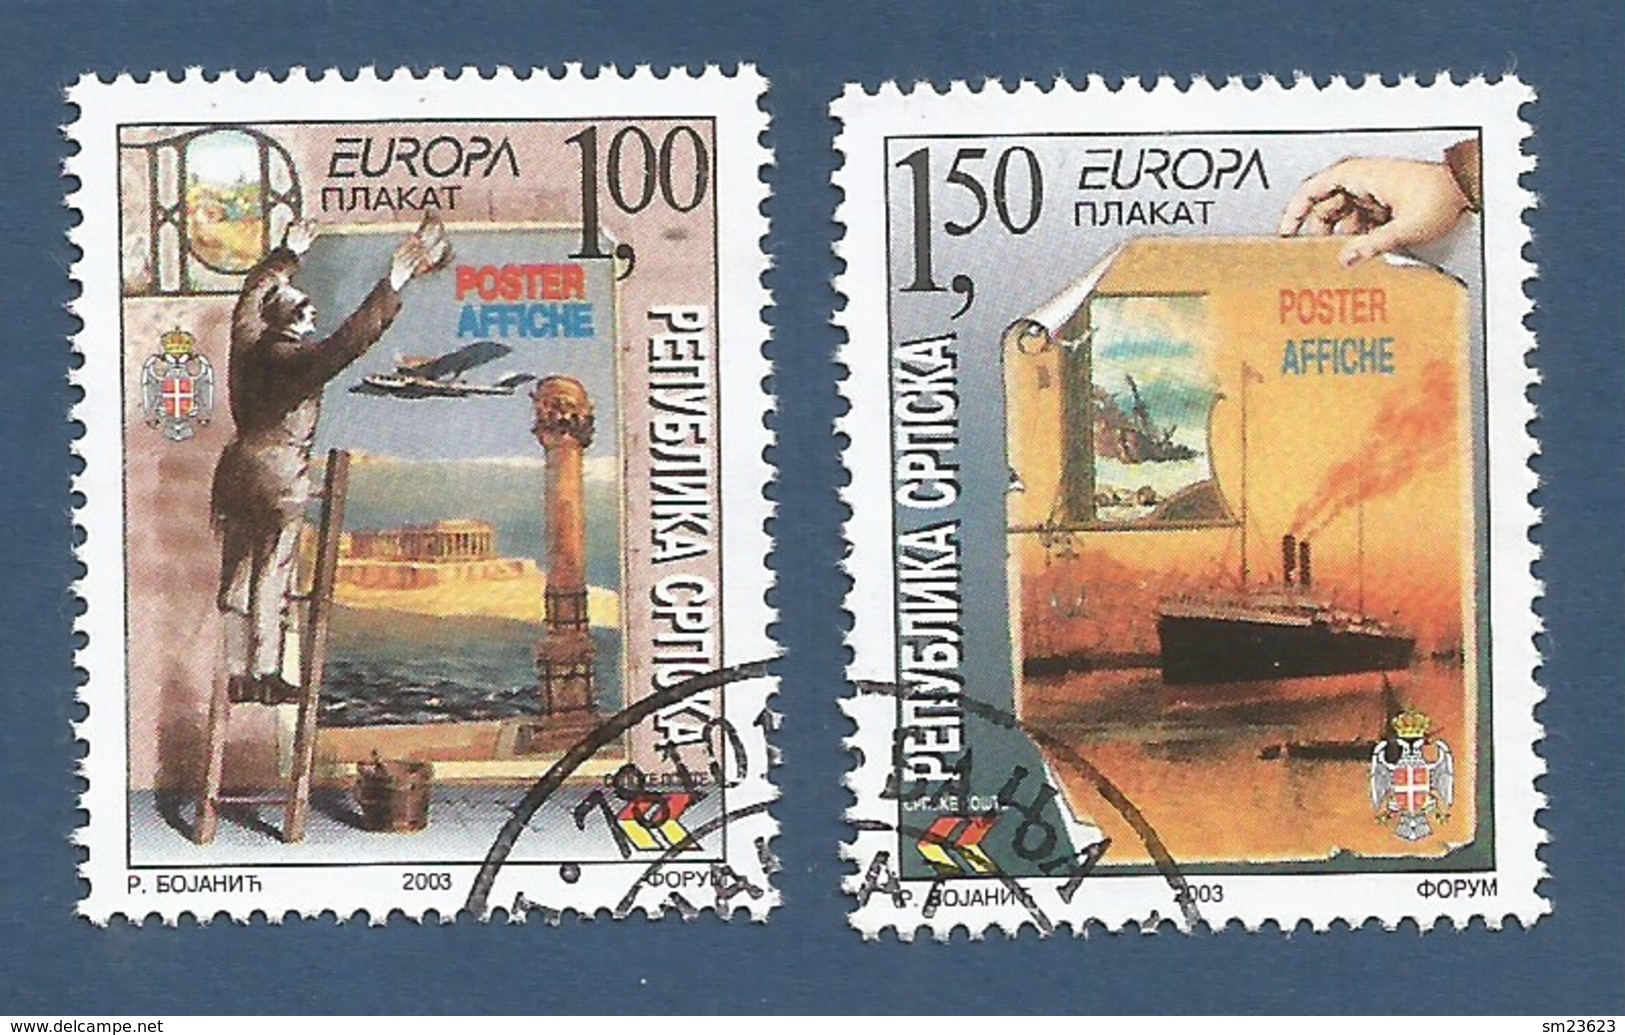 Bosnien Herzegowina Serbische Rep 2003   Mi.Nr. 271 / 272 A , EUROPA CEPT - Plakatkunst - Gestempelt / Fine Used / (o) - 2003